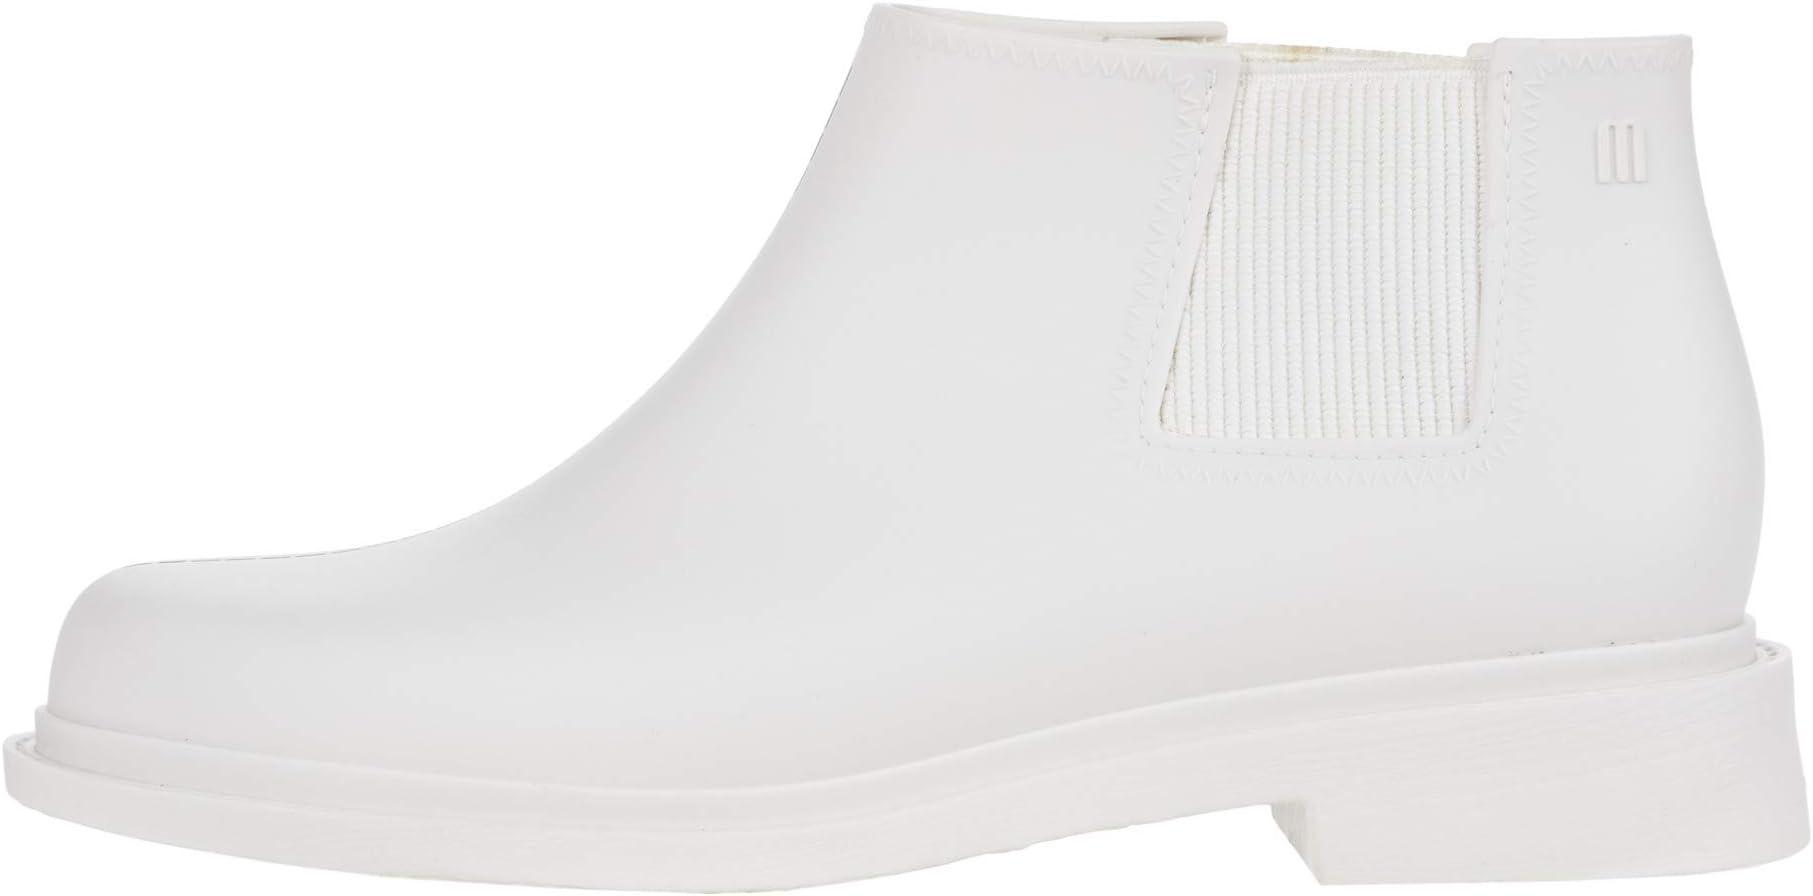 Melissa Shoes Skin | Women's shoes | 2020 Newest